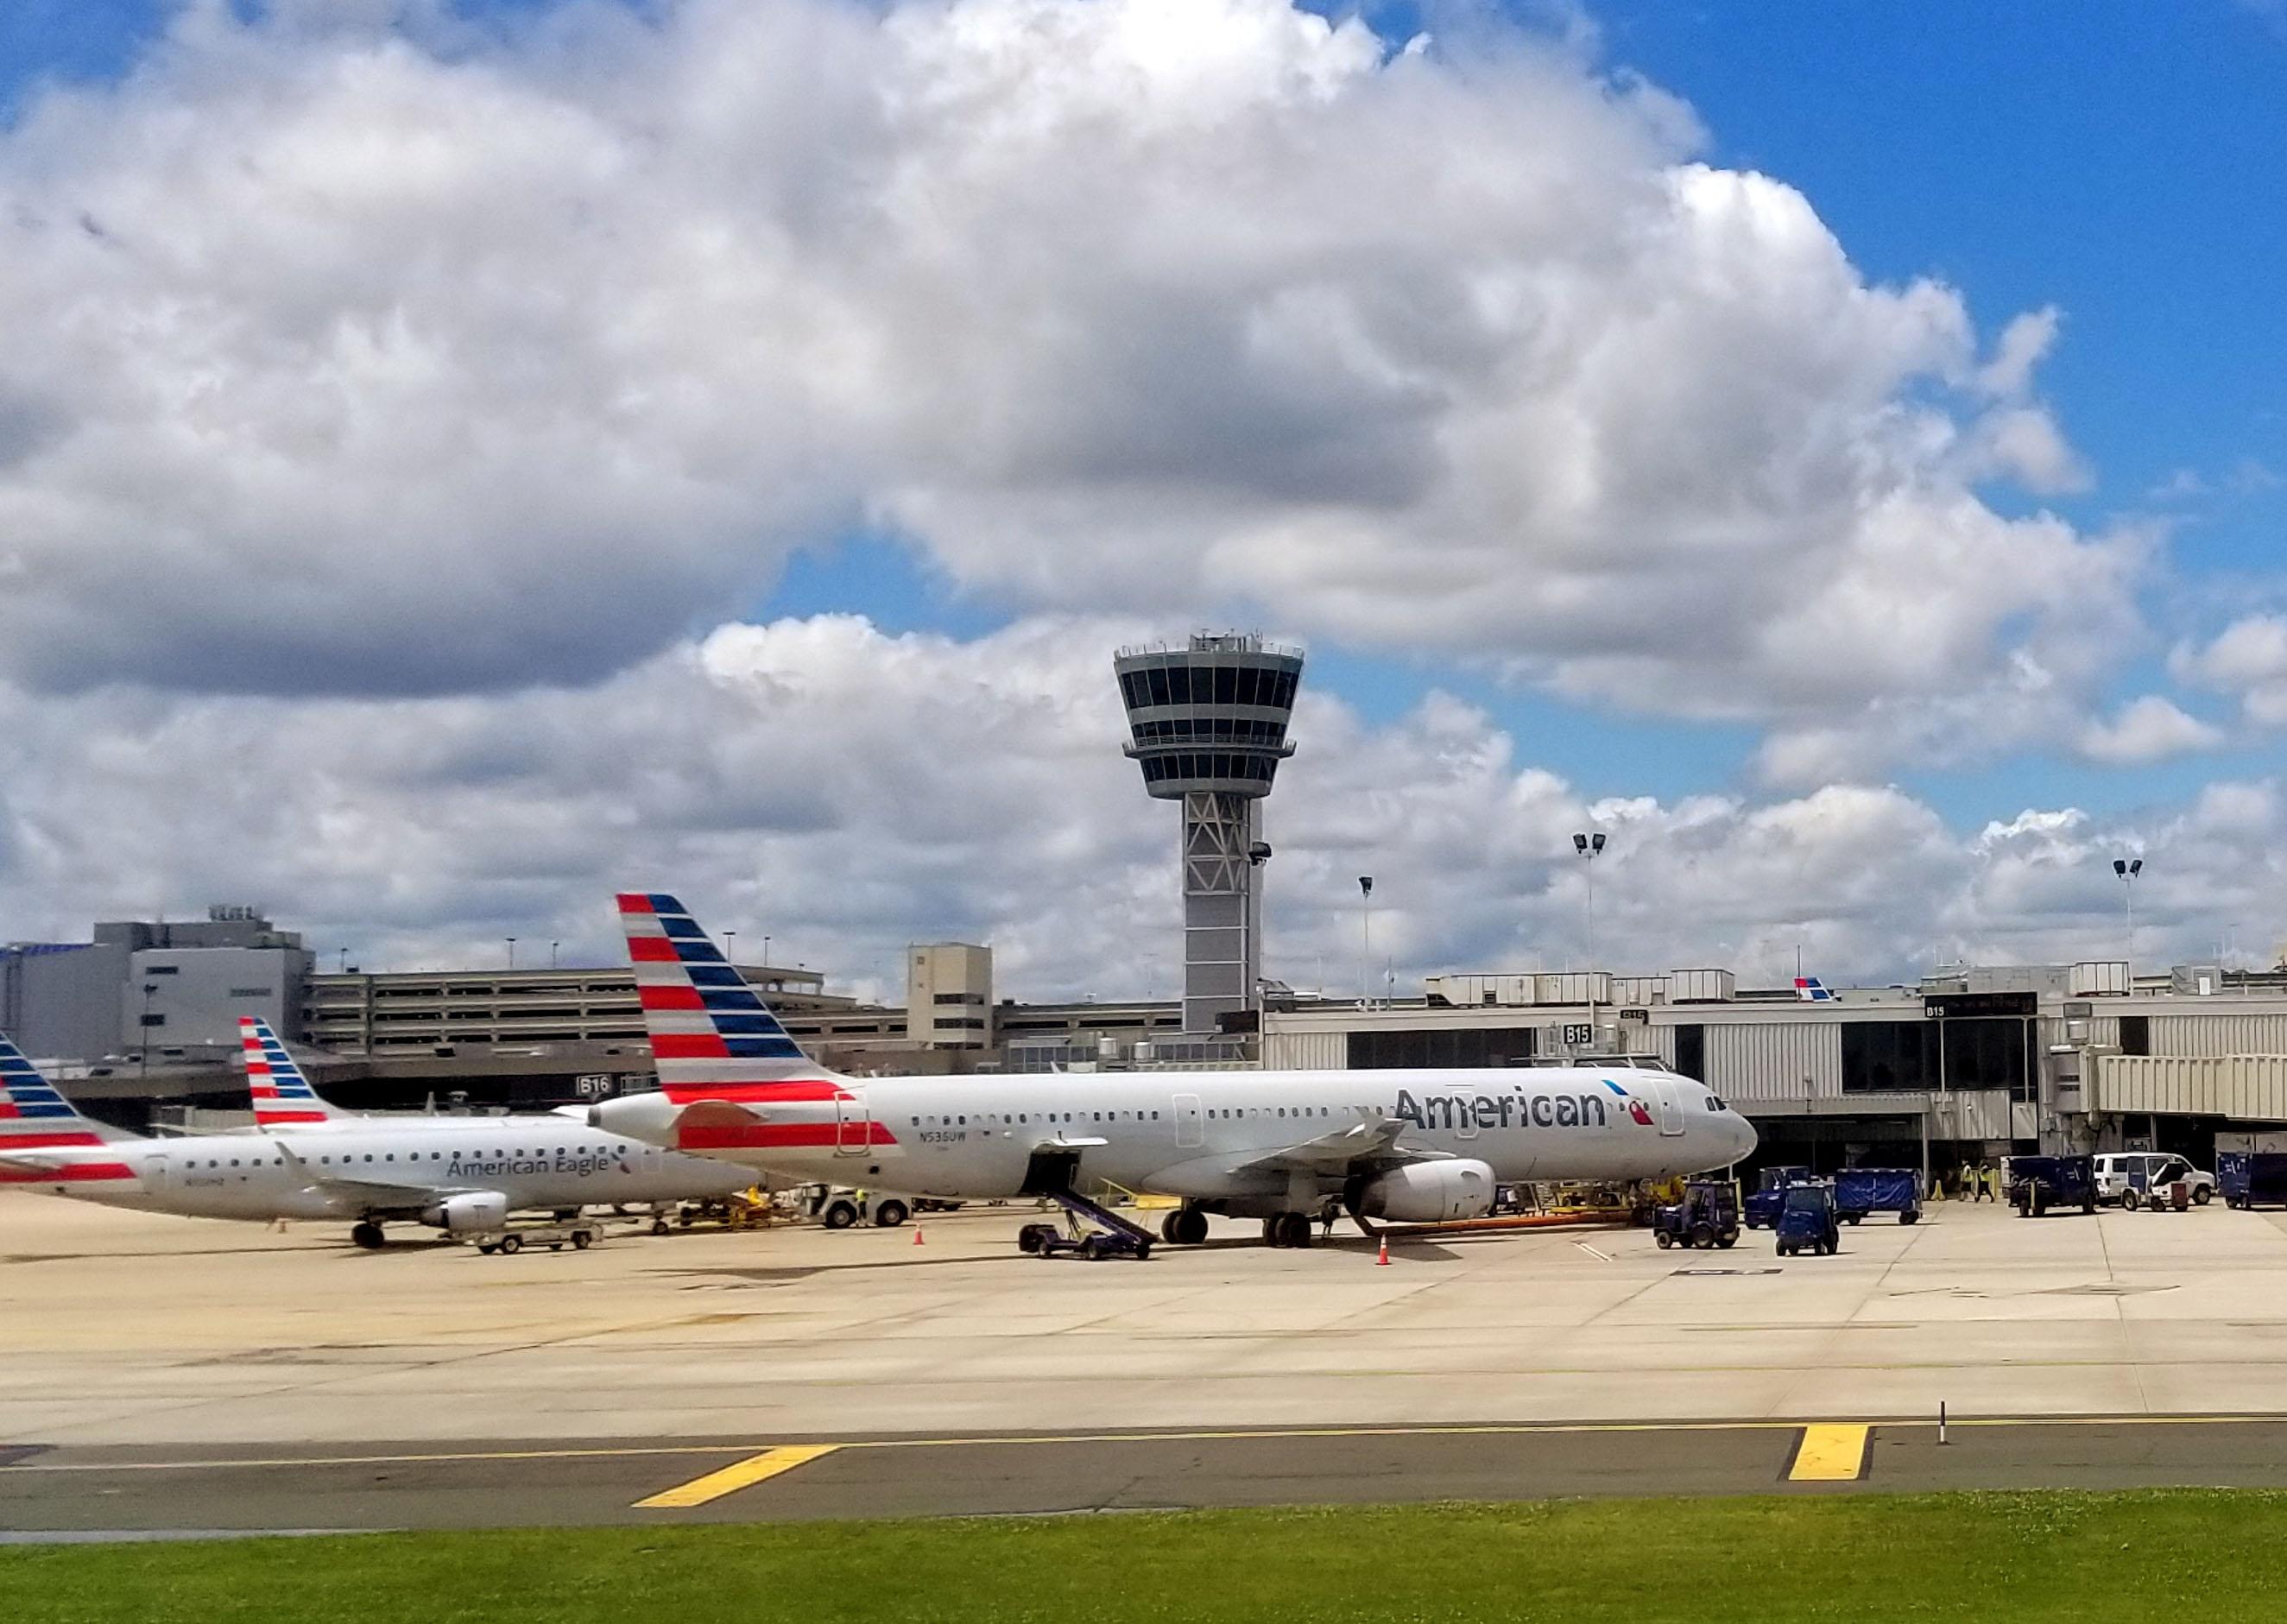 American Airlines planes are viewed at Philadelphia International Airport on July 7, 2017 in Philadelphia, Pennsylvania. DANIEL SLIM—AFP/Getty Images